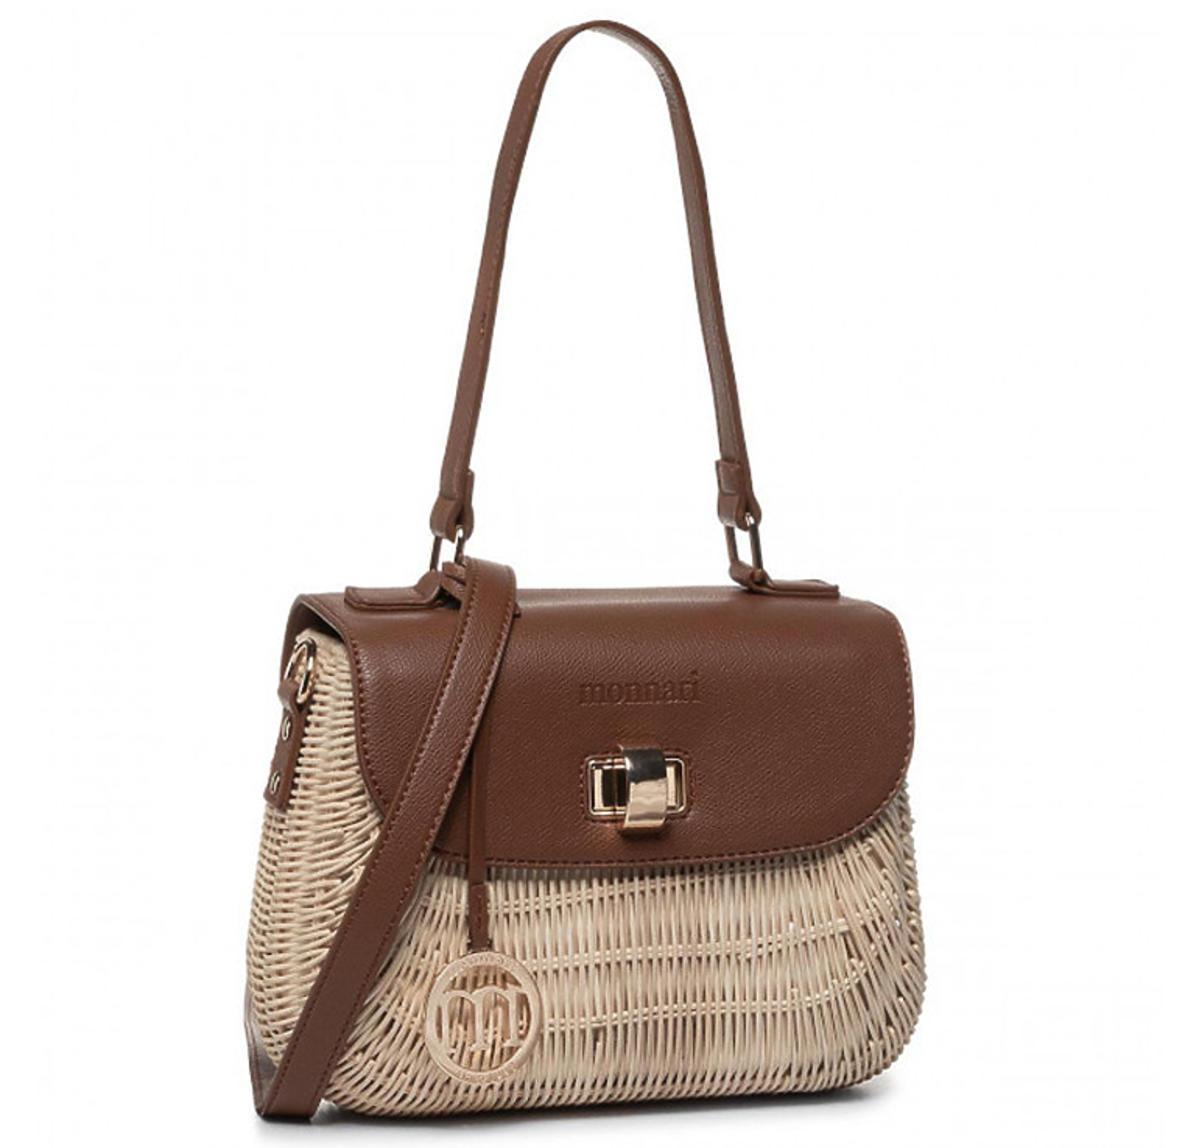 Pleciona torebki Monnari - trendy na jesień 2020